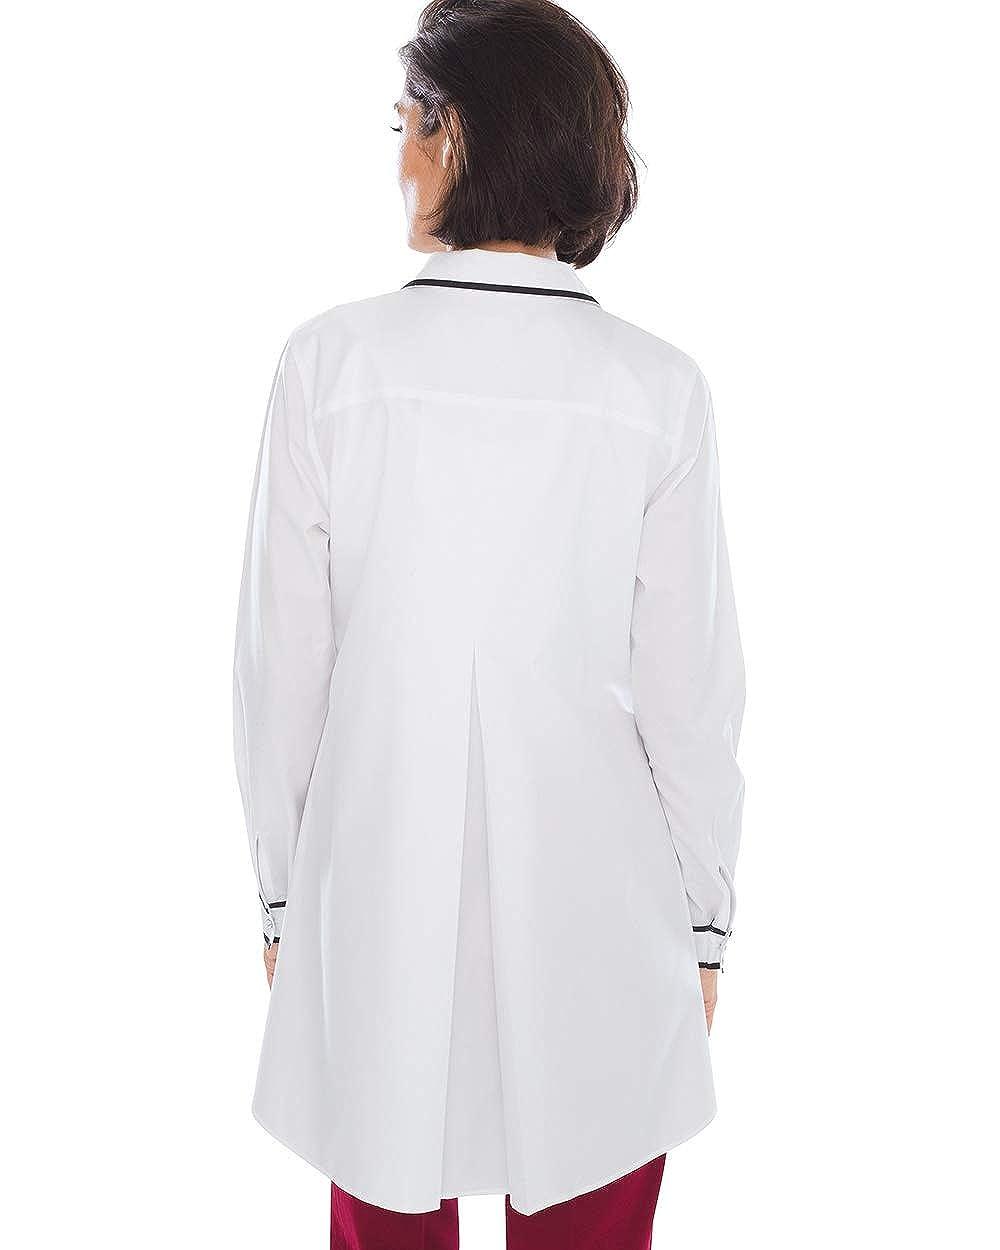 Chicos Womens No-Iron Cotton Contrast-Trim Tunic White